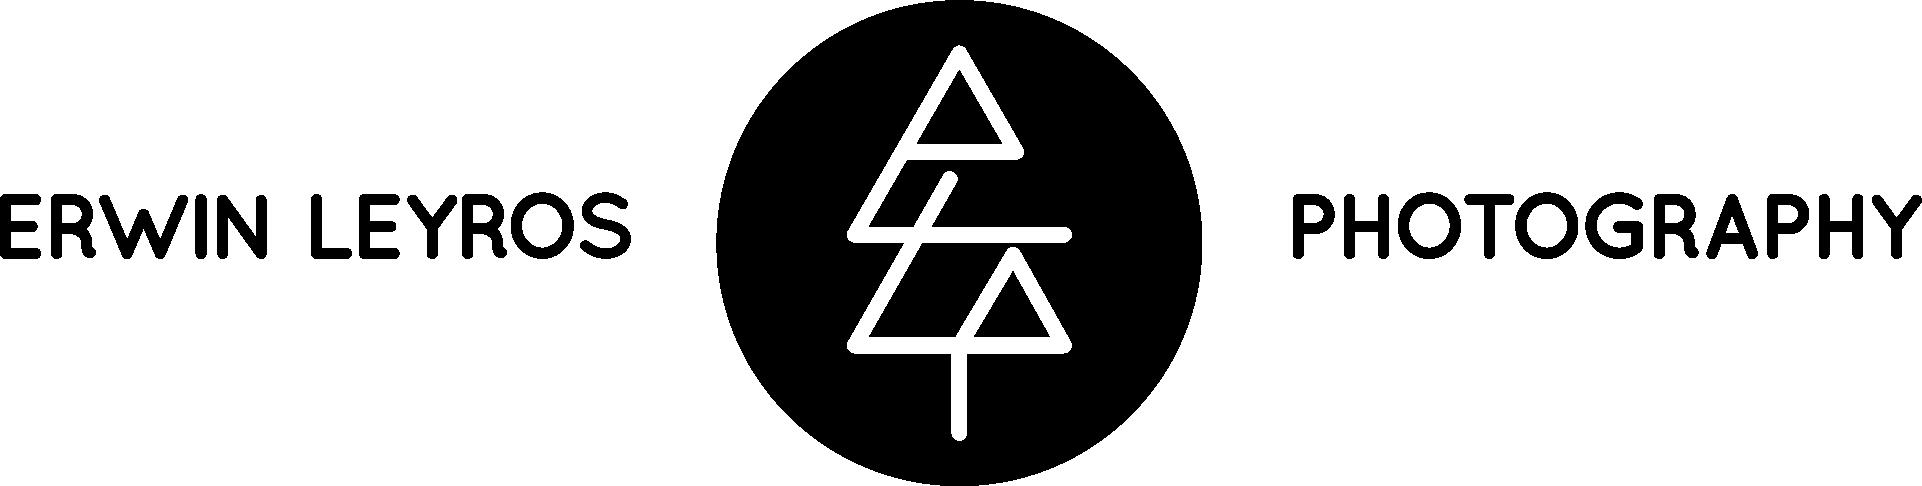 ErwinLeyros_logo-02 copy_small.png